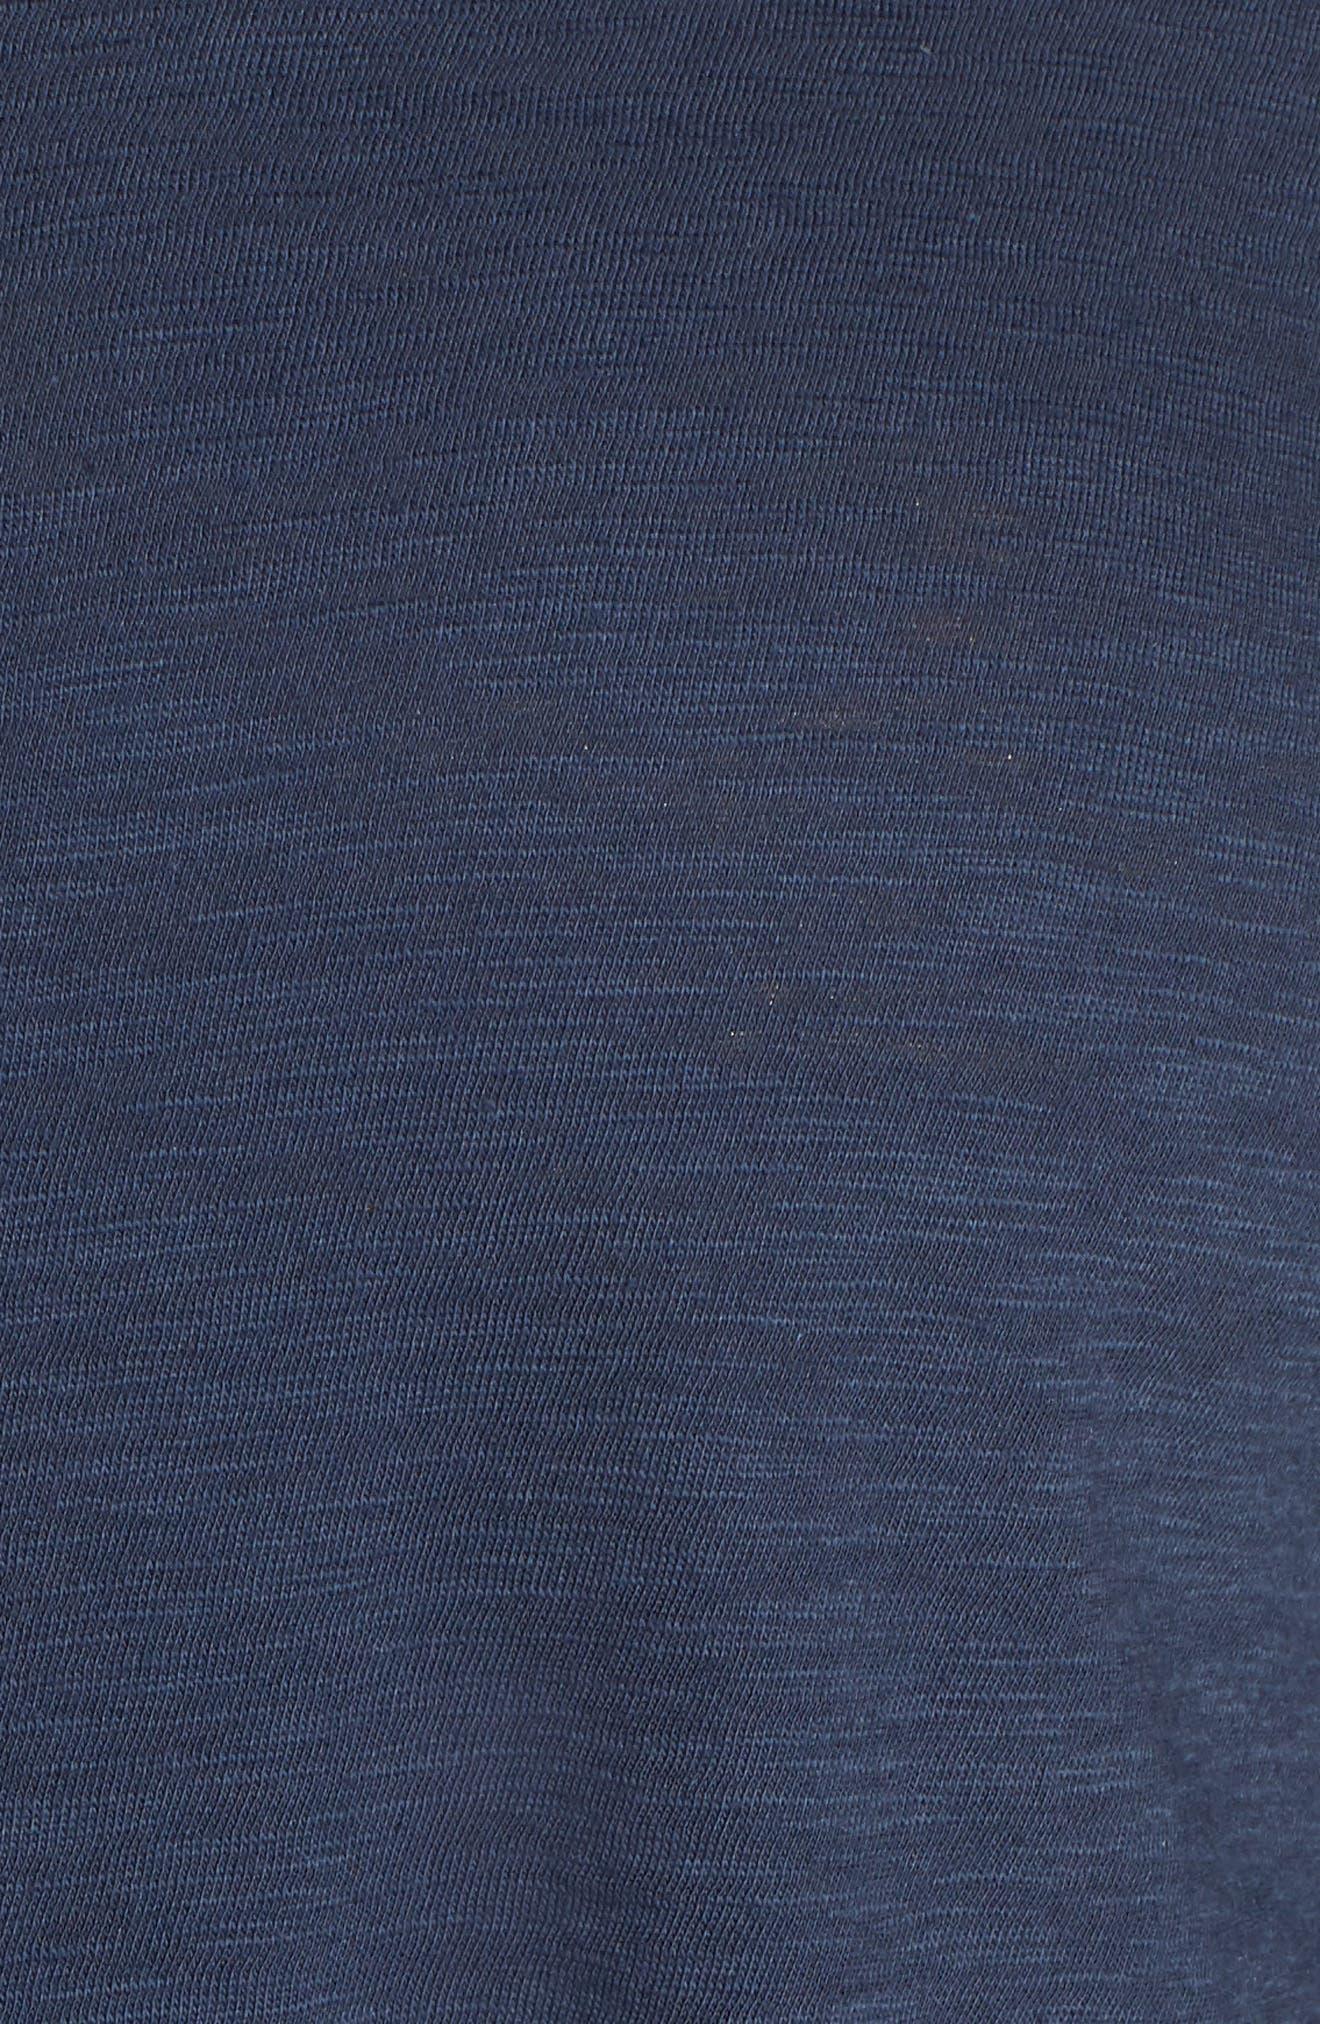 Dolman Sleeve Tee,                             Alternate thumbnail 5, color,                             Navy Indigo